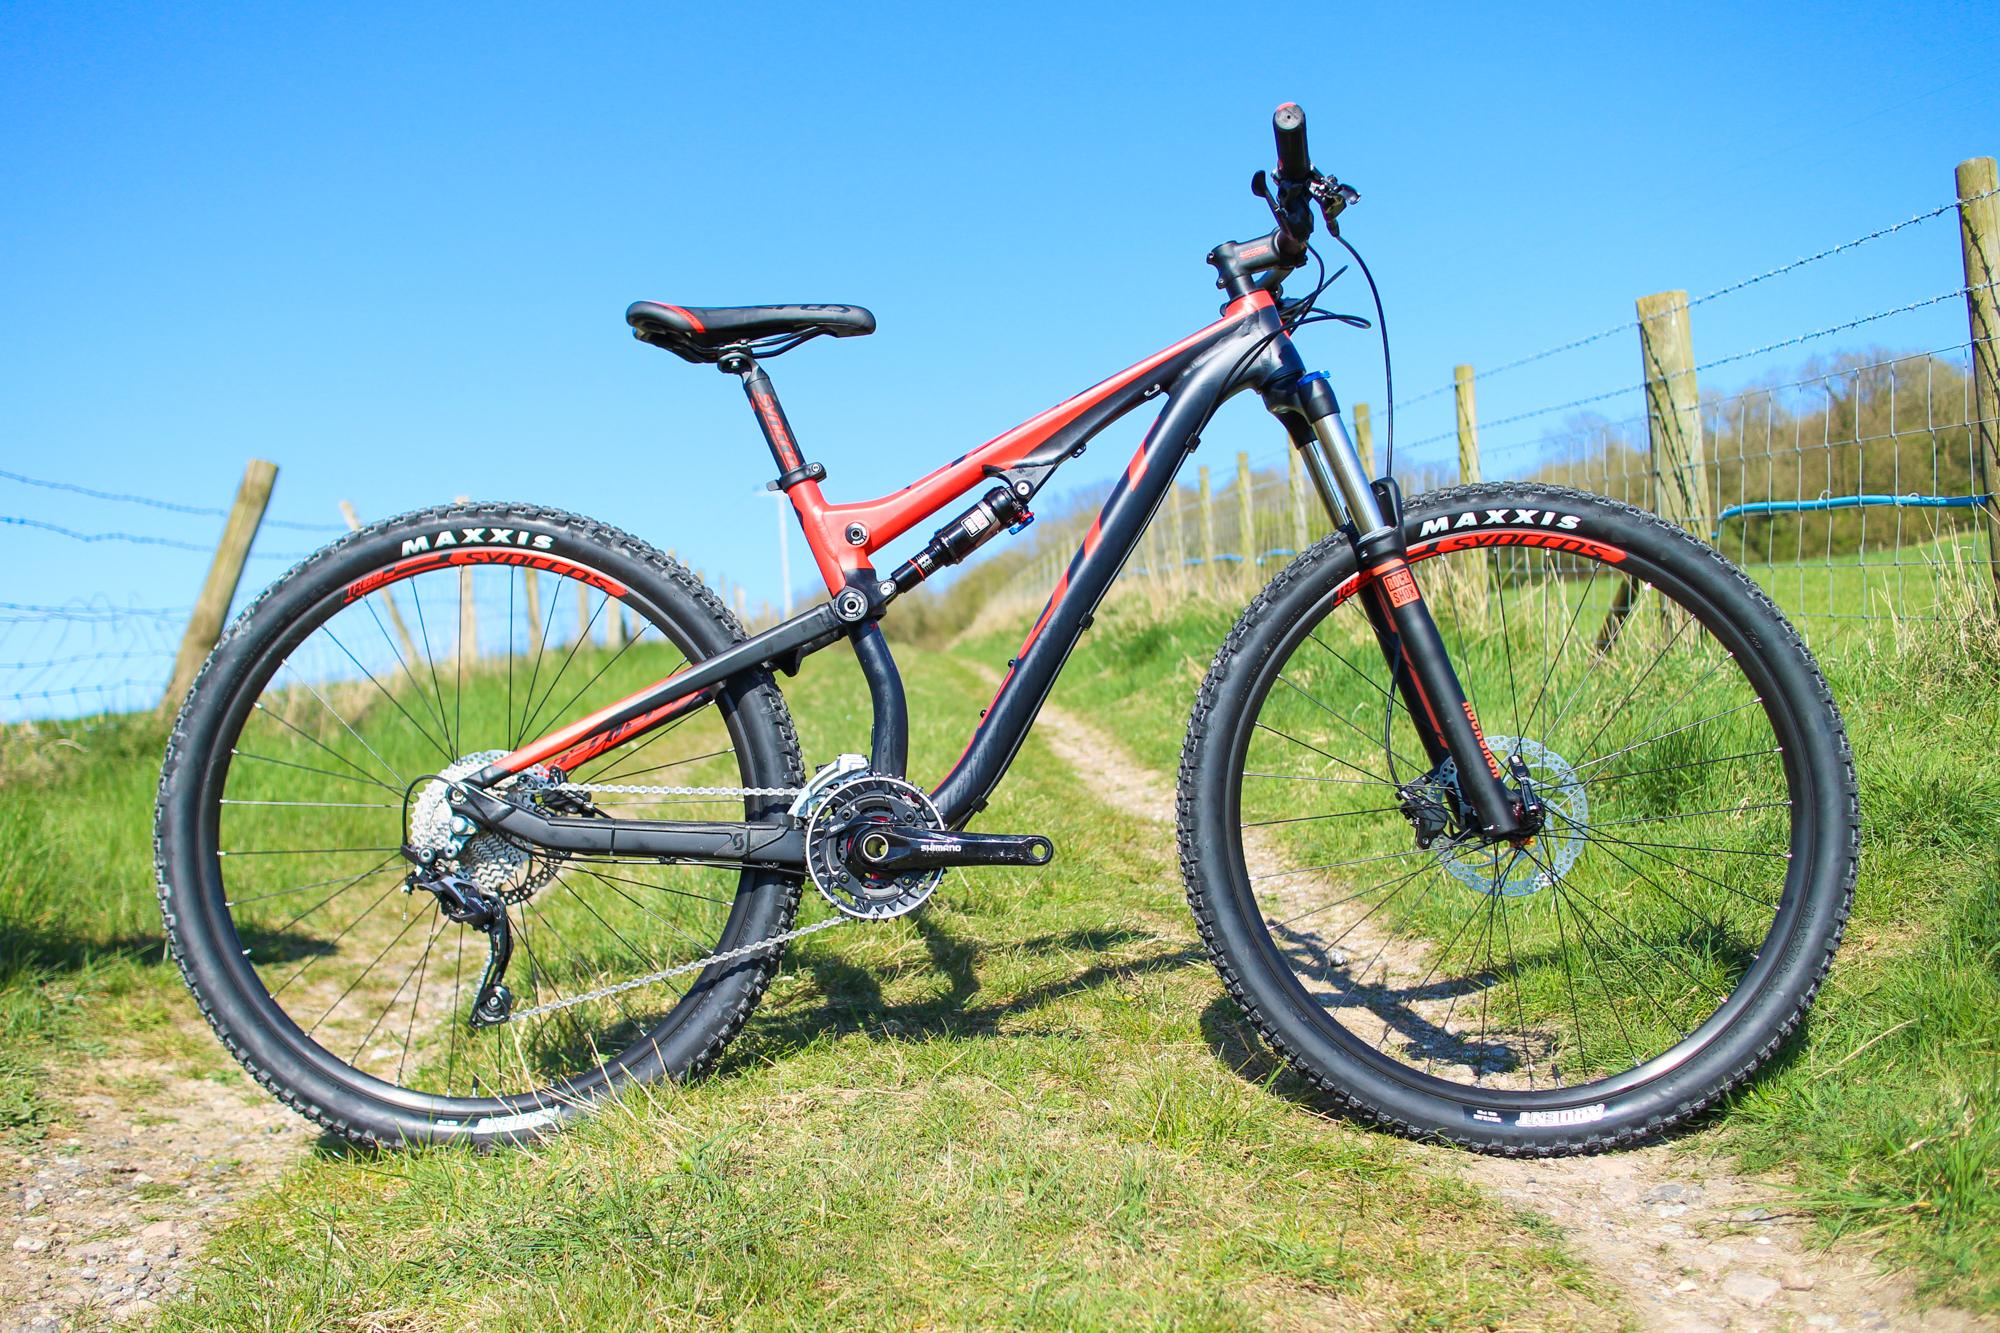 Scott Bicycles Genius 950 2015 Reviews 187 Bikes 187 Trail